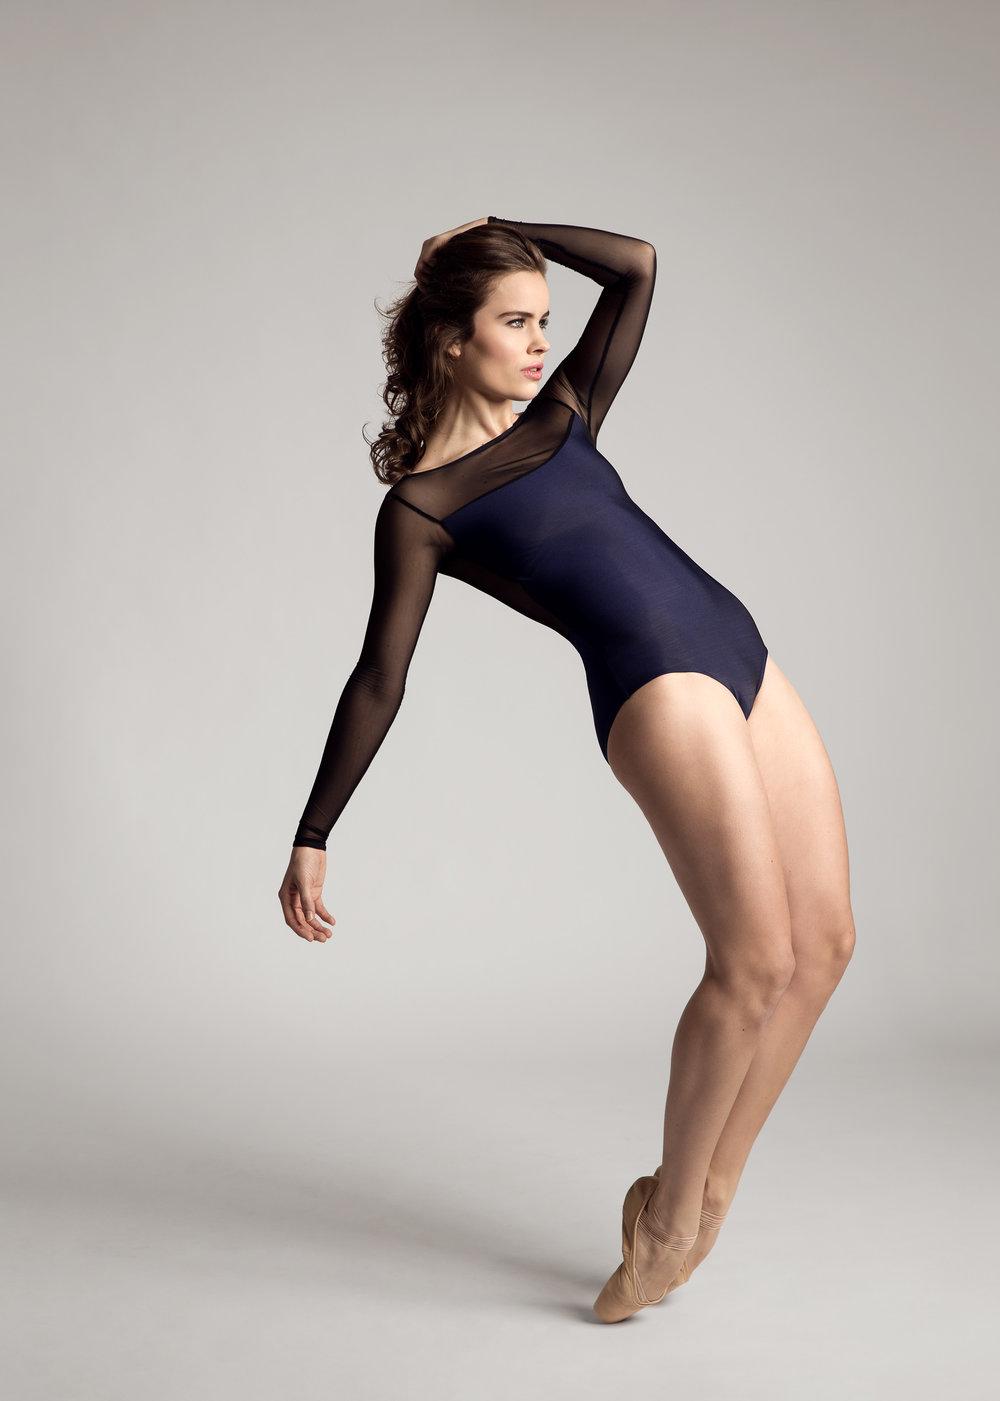 Danseres Lindy Bremer